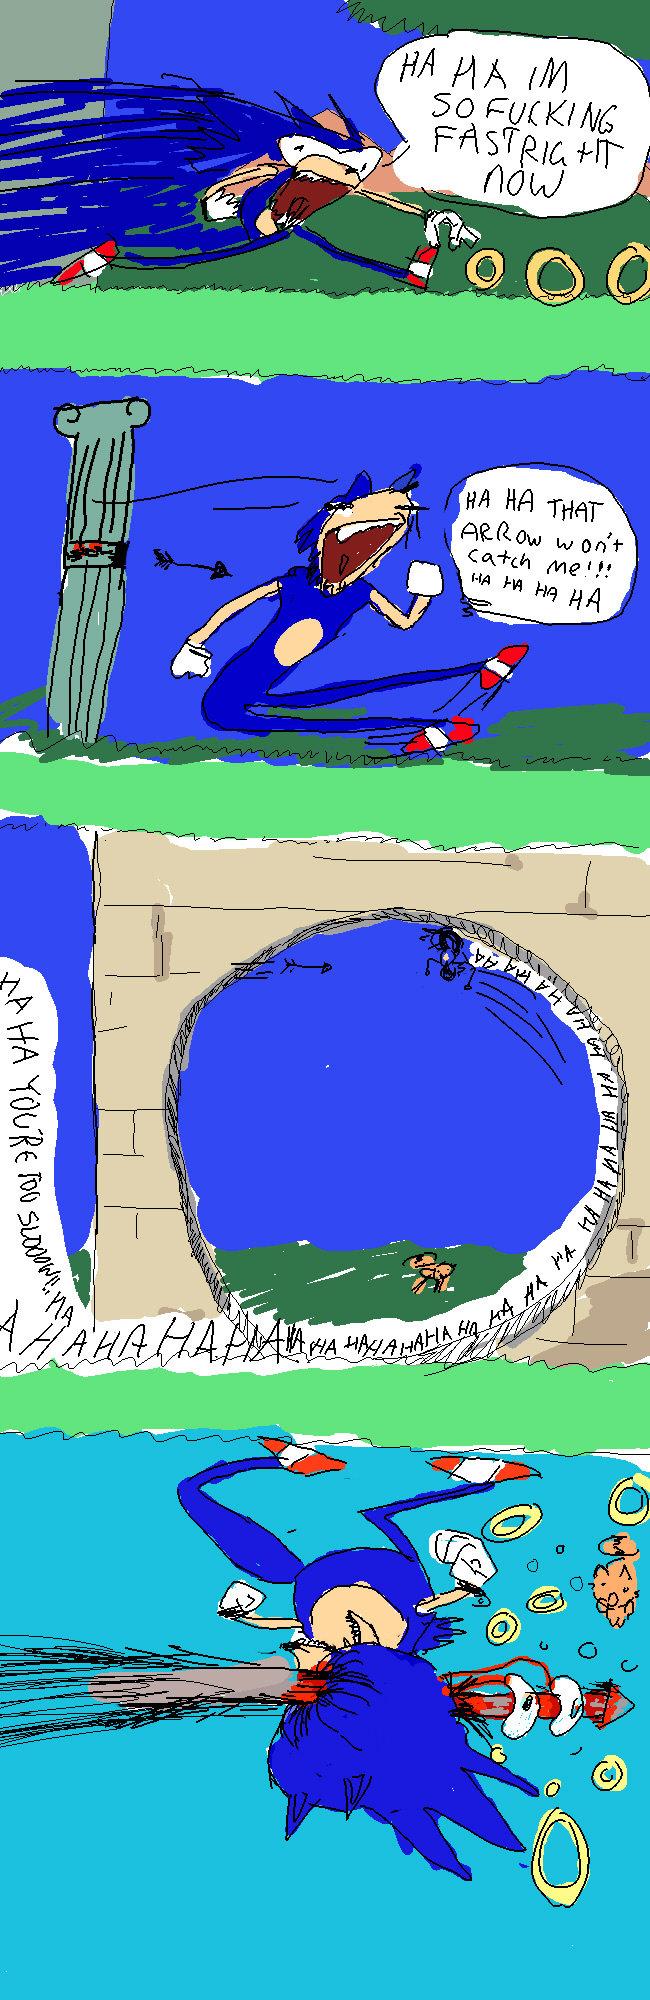 "Sonic runs into a problem. . Eii' lla Lqg CEI riid i"" gail intill i' efil. I loled. Sonic runs into a problem Eii' lla Lqg CEI riid i"" gail intill i' efil I loled"